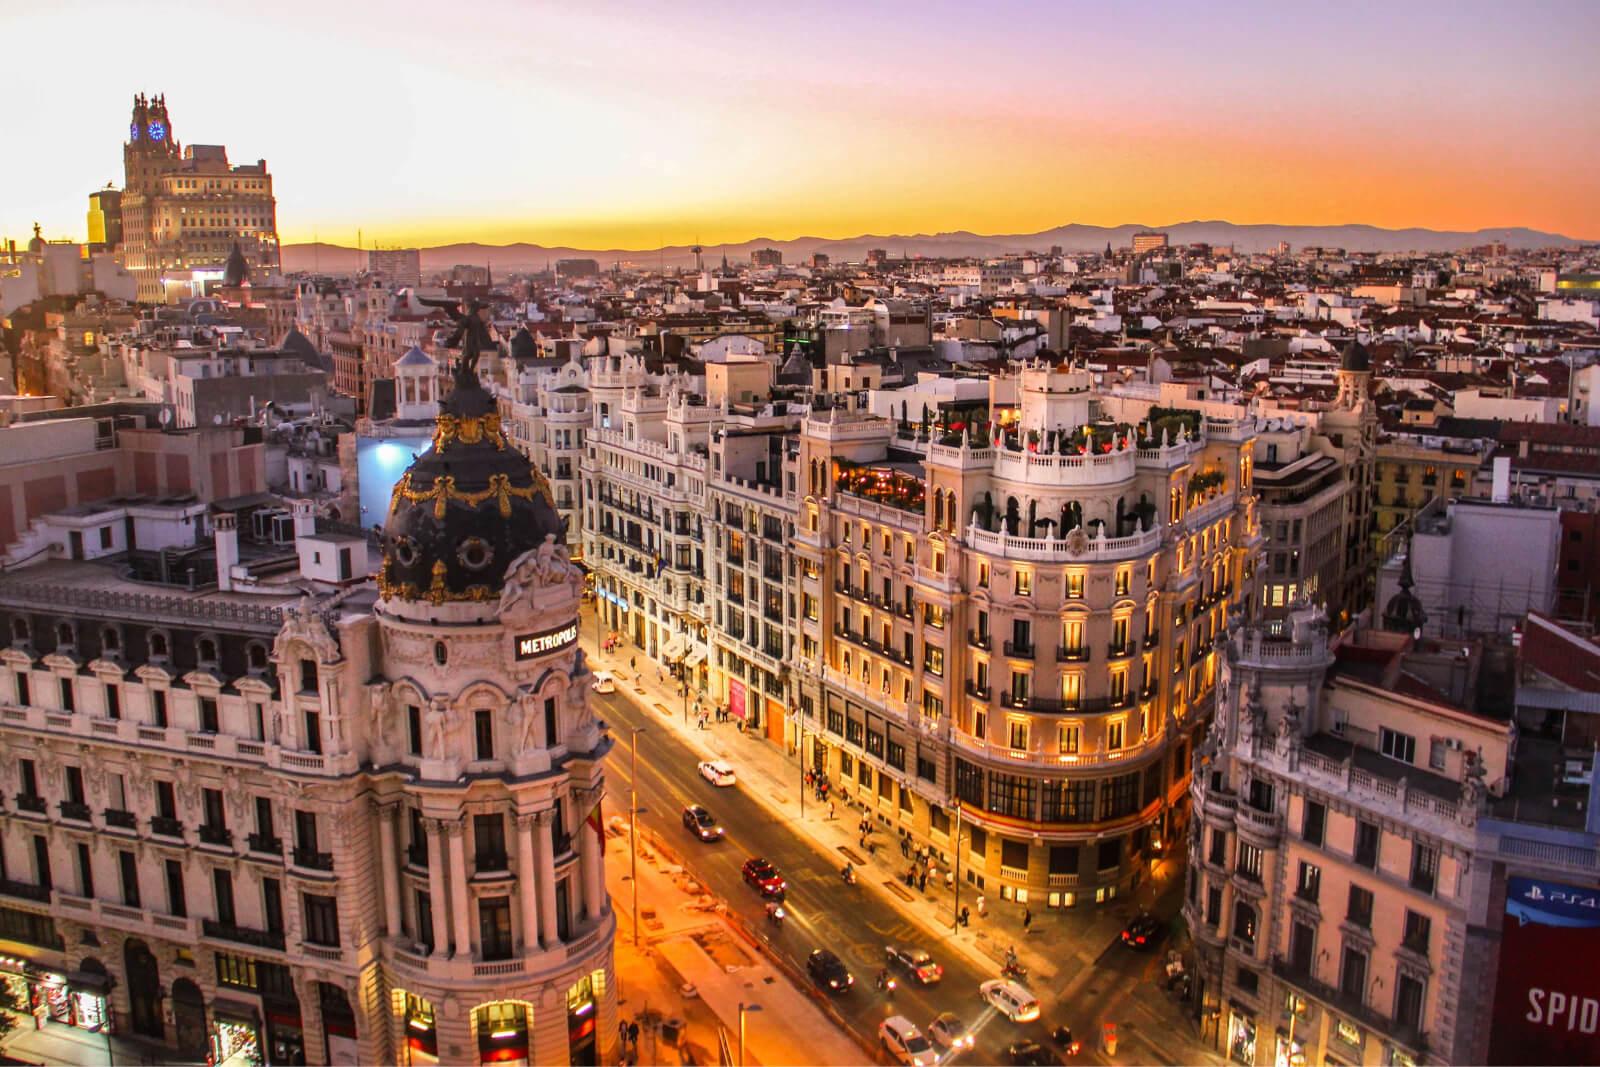 Skyline shot of Barcelona, Spain